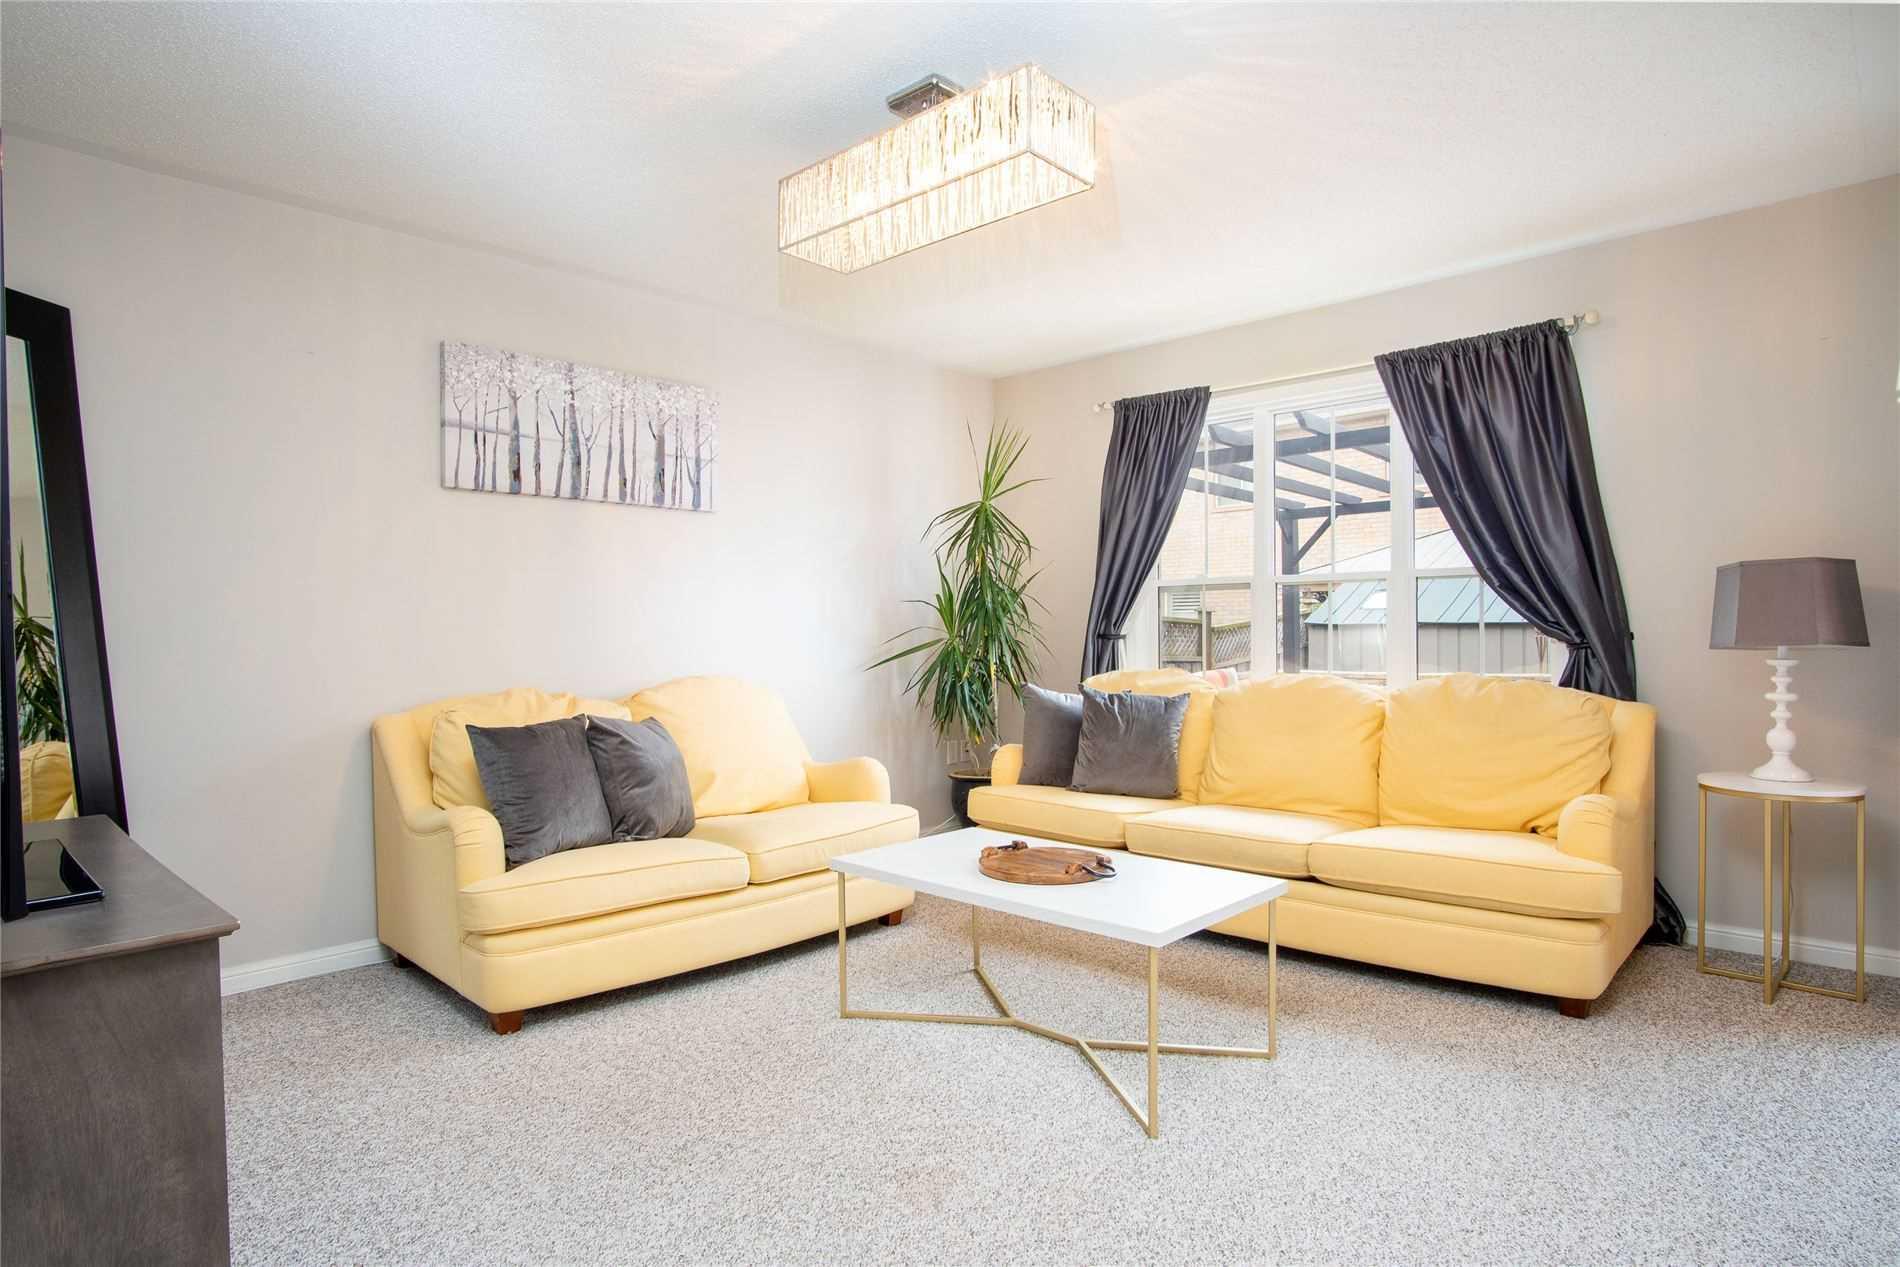 827 Biggar Hts - Coates Detached for sale, 4 Bedrooms (W5400280) - #13